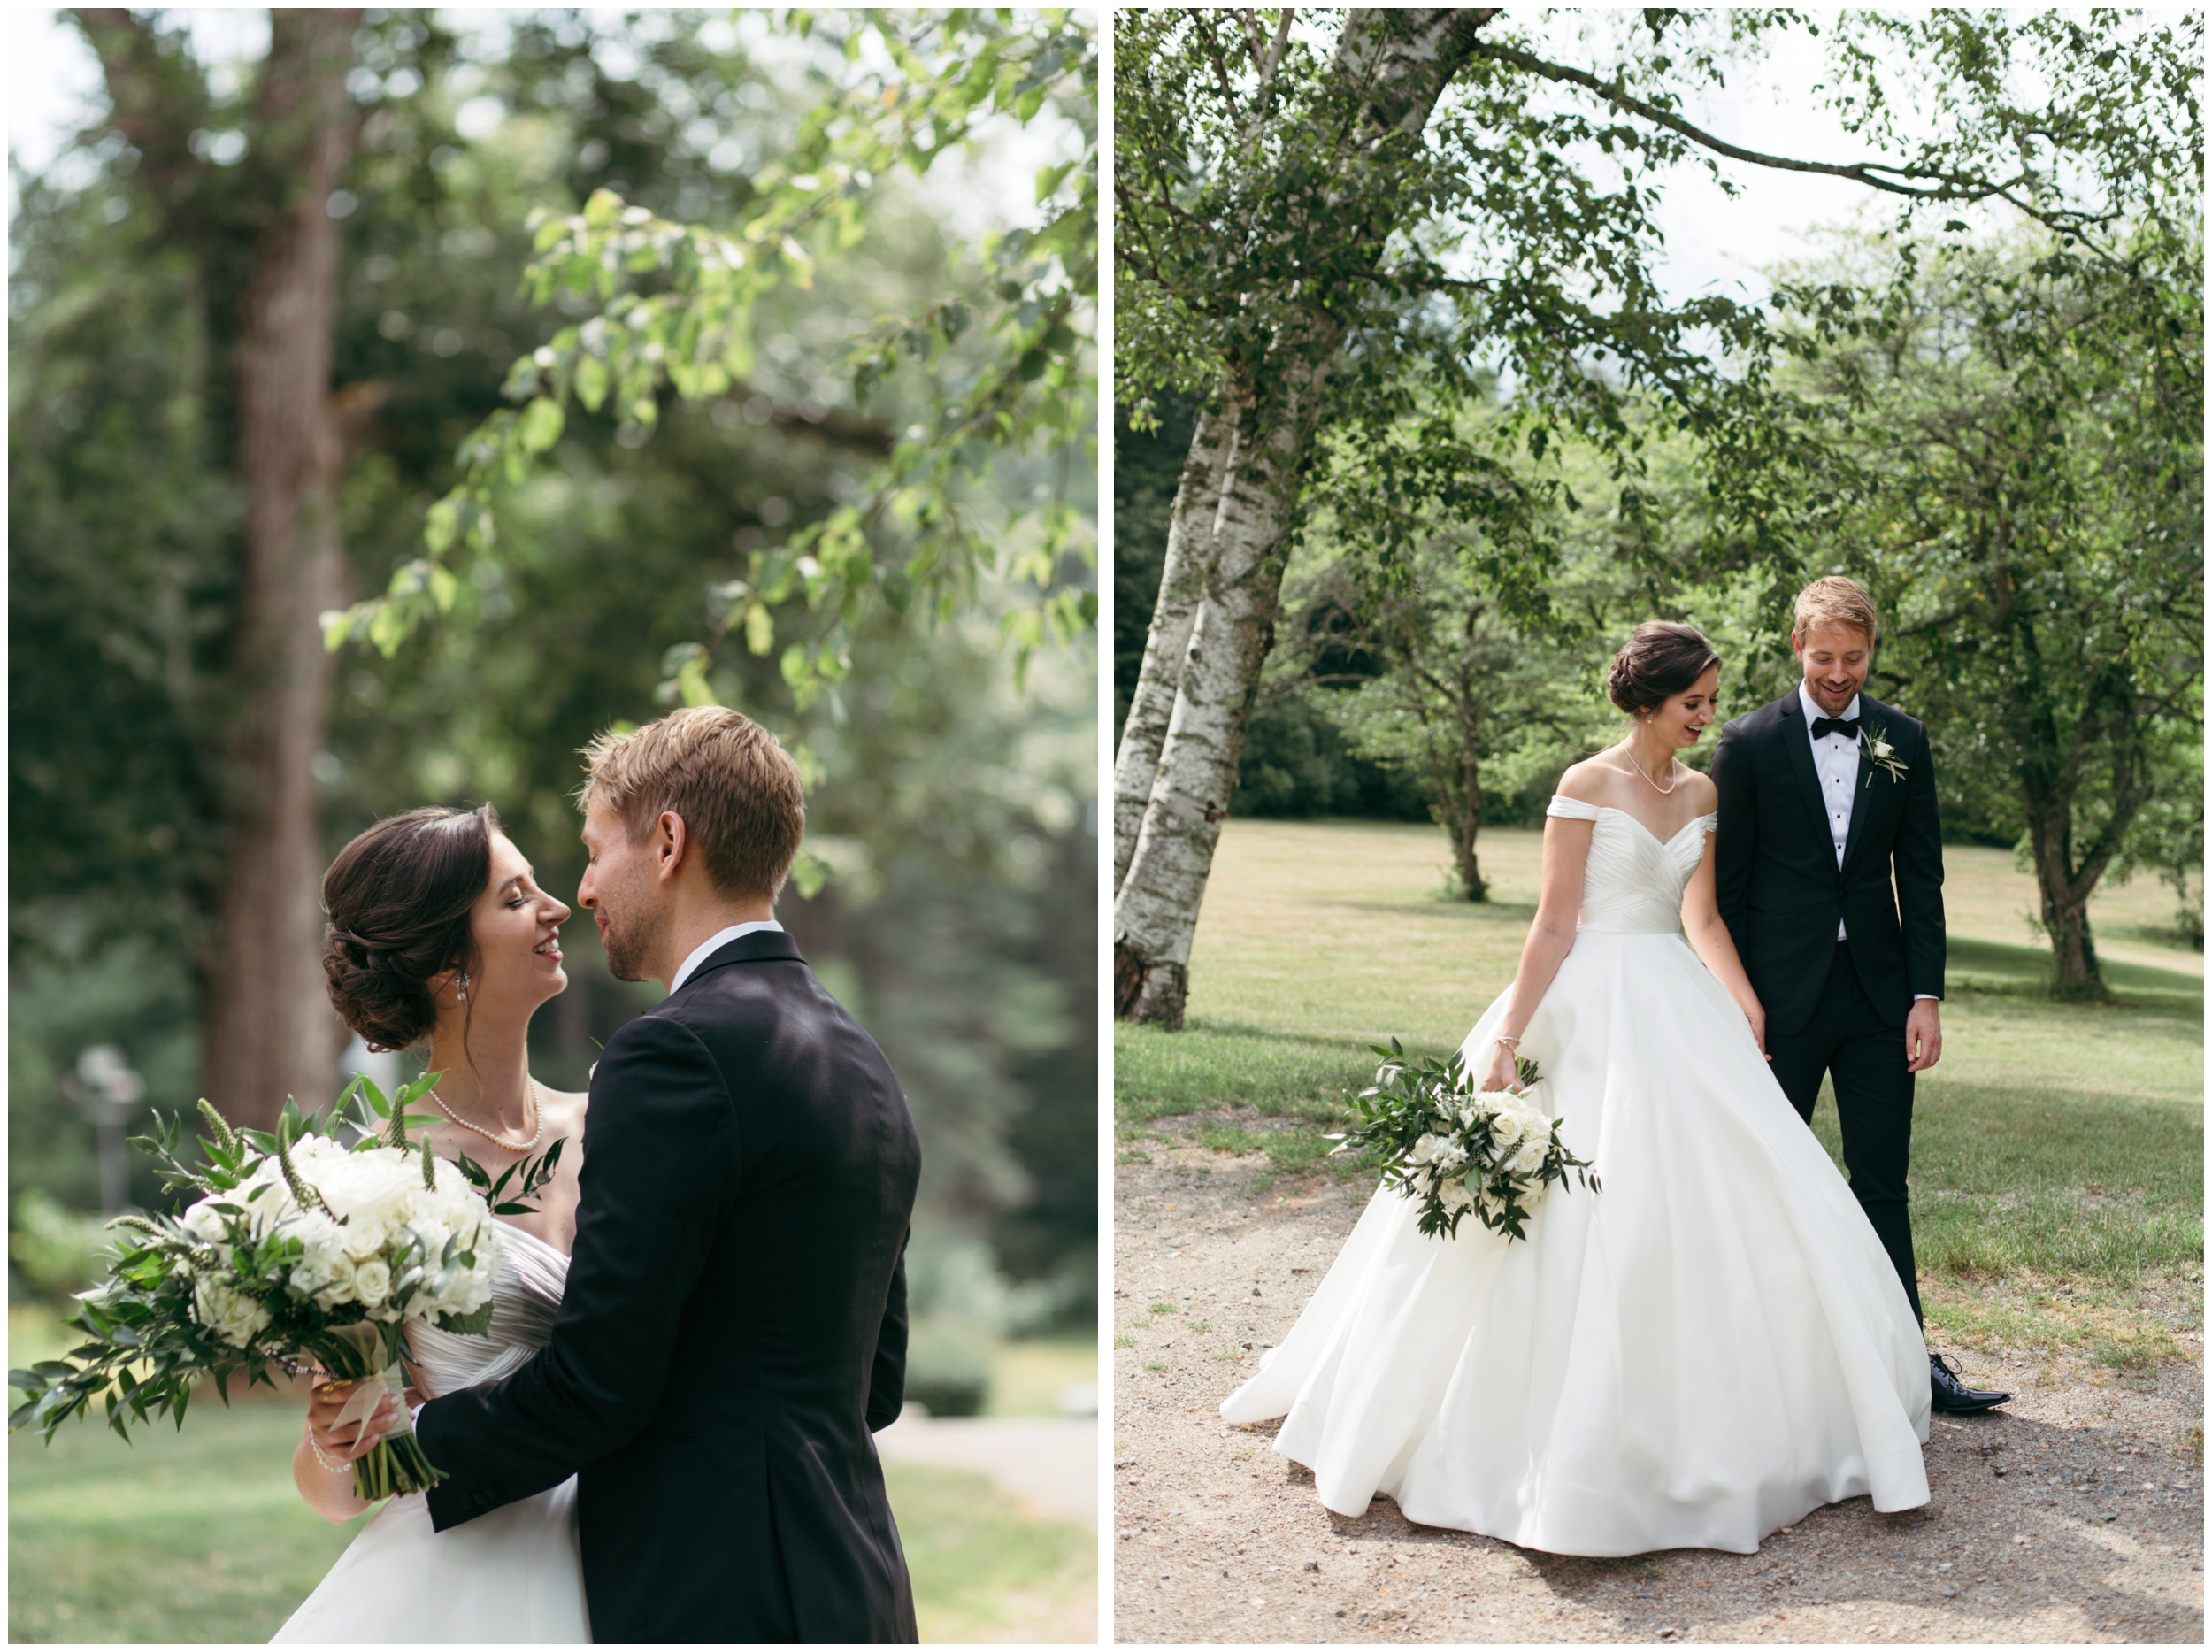 Willowdale-Estate-Wedding-Bailey-Q-Photo-Boston-Wedding-Photographer-015.JPG